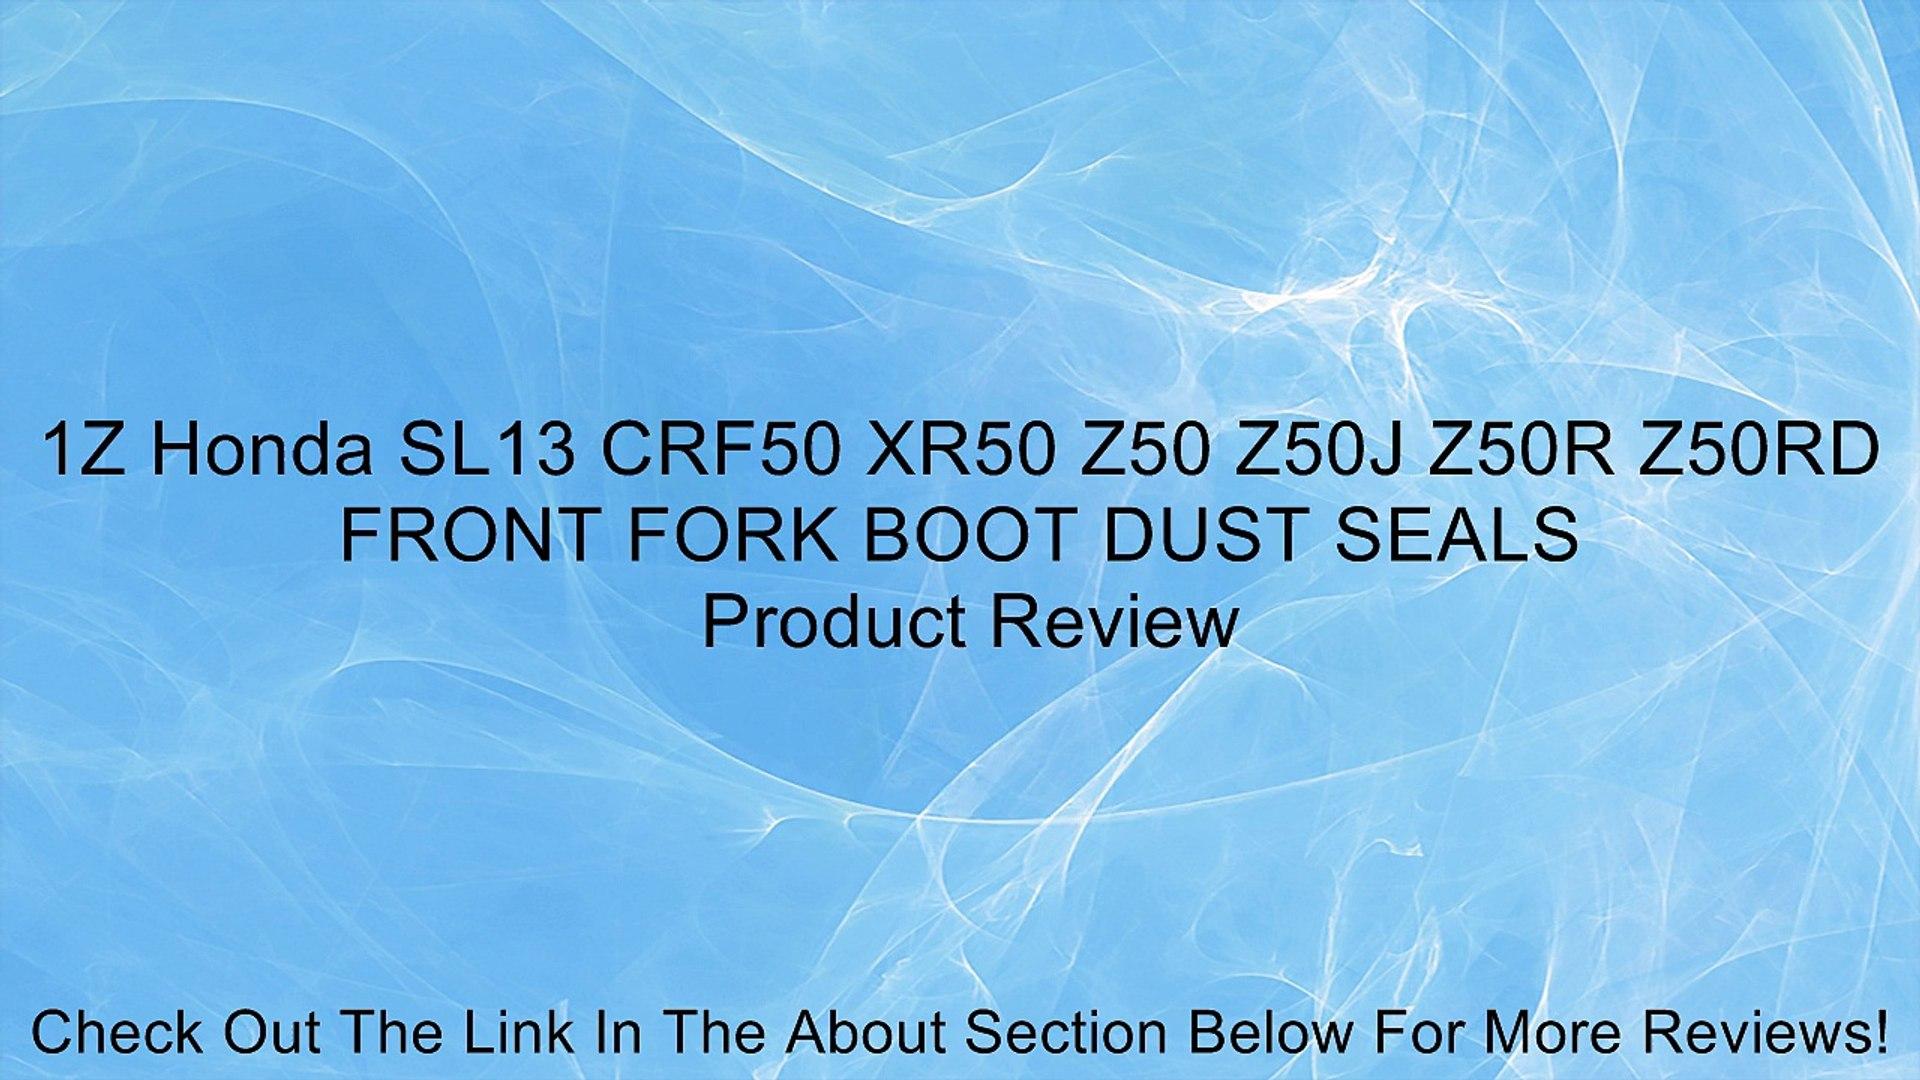 Honda CRF50 XR50 Z50 Z50J Z50R Z50RD FRONT FORK BOOT DUST SEALS V SL13